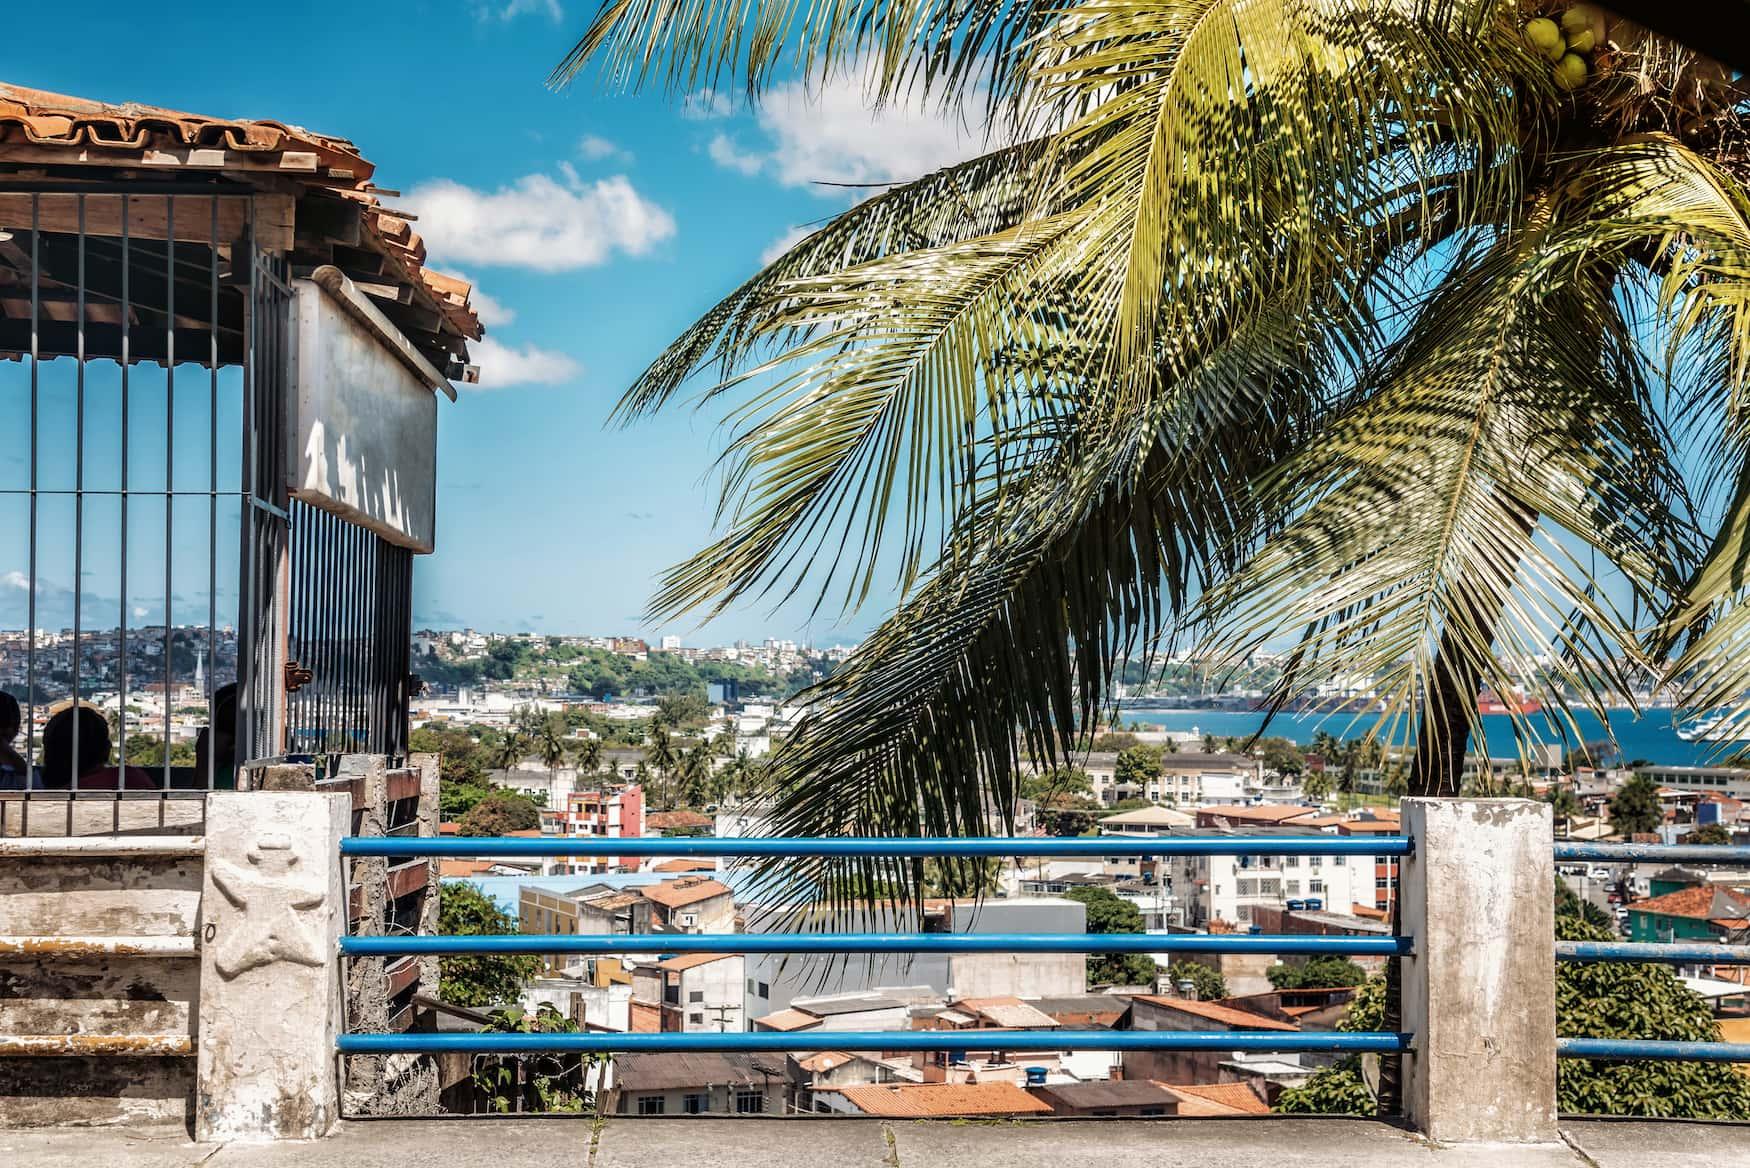 Blick auf Vororte in Salvador da Bahia